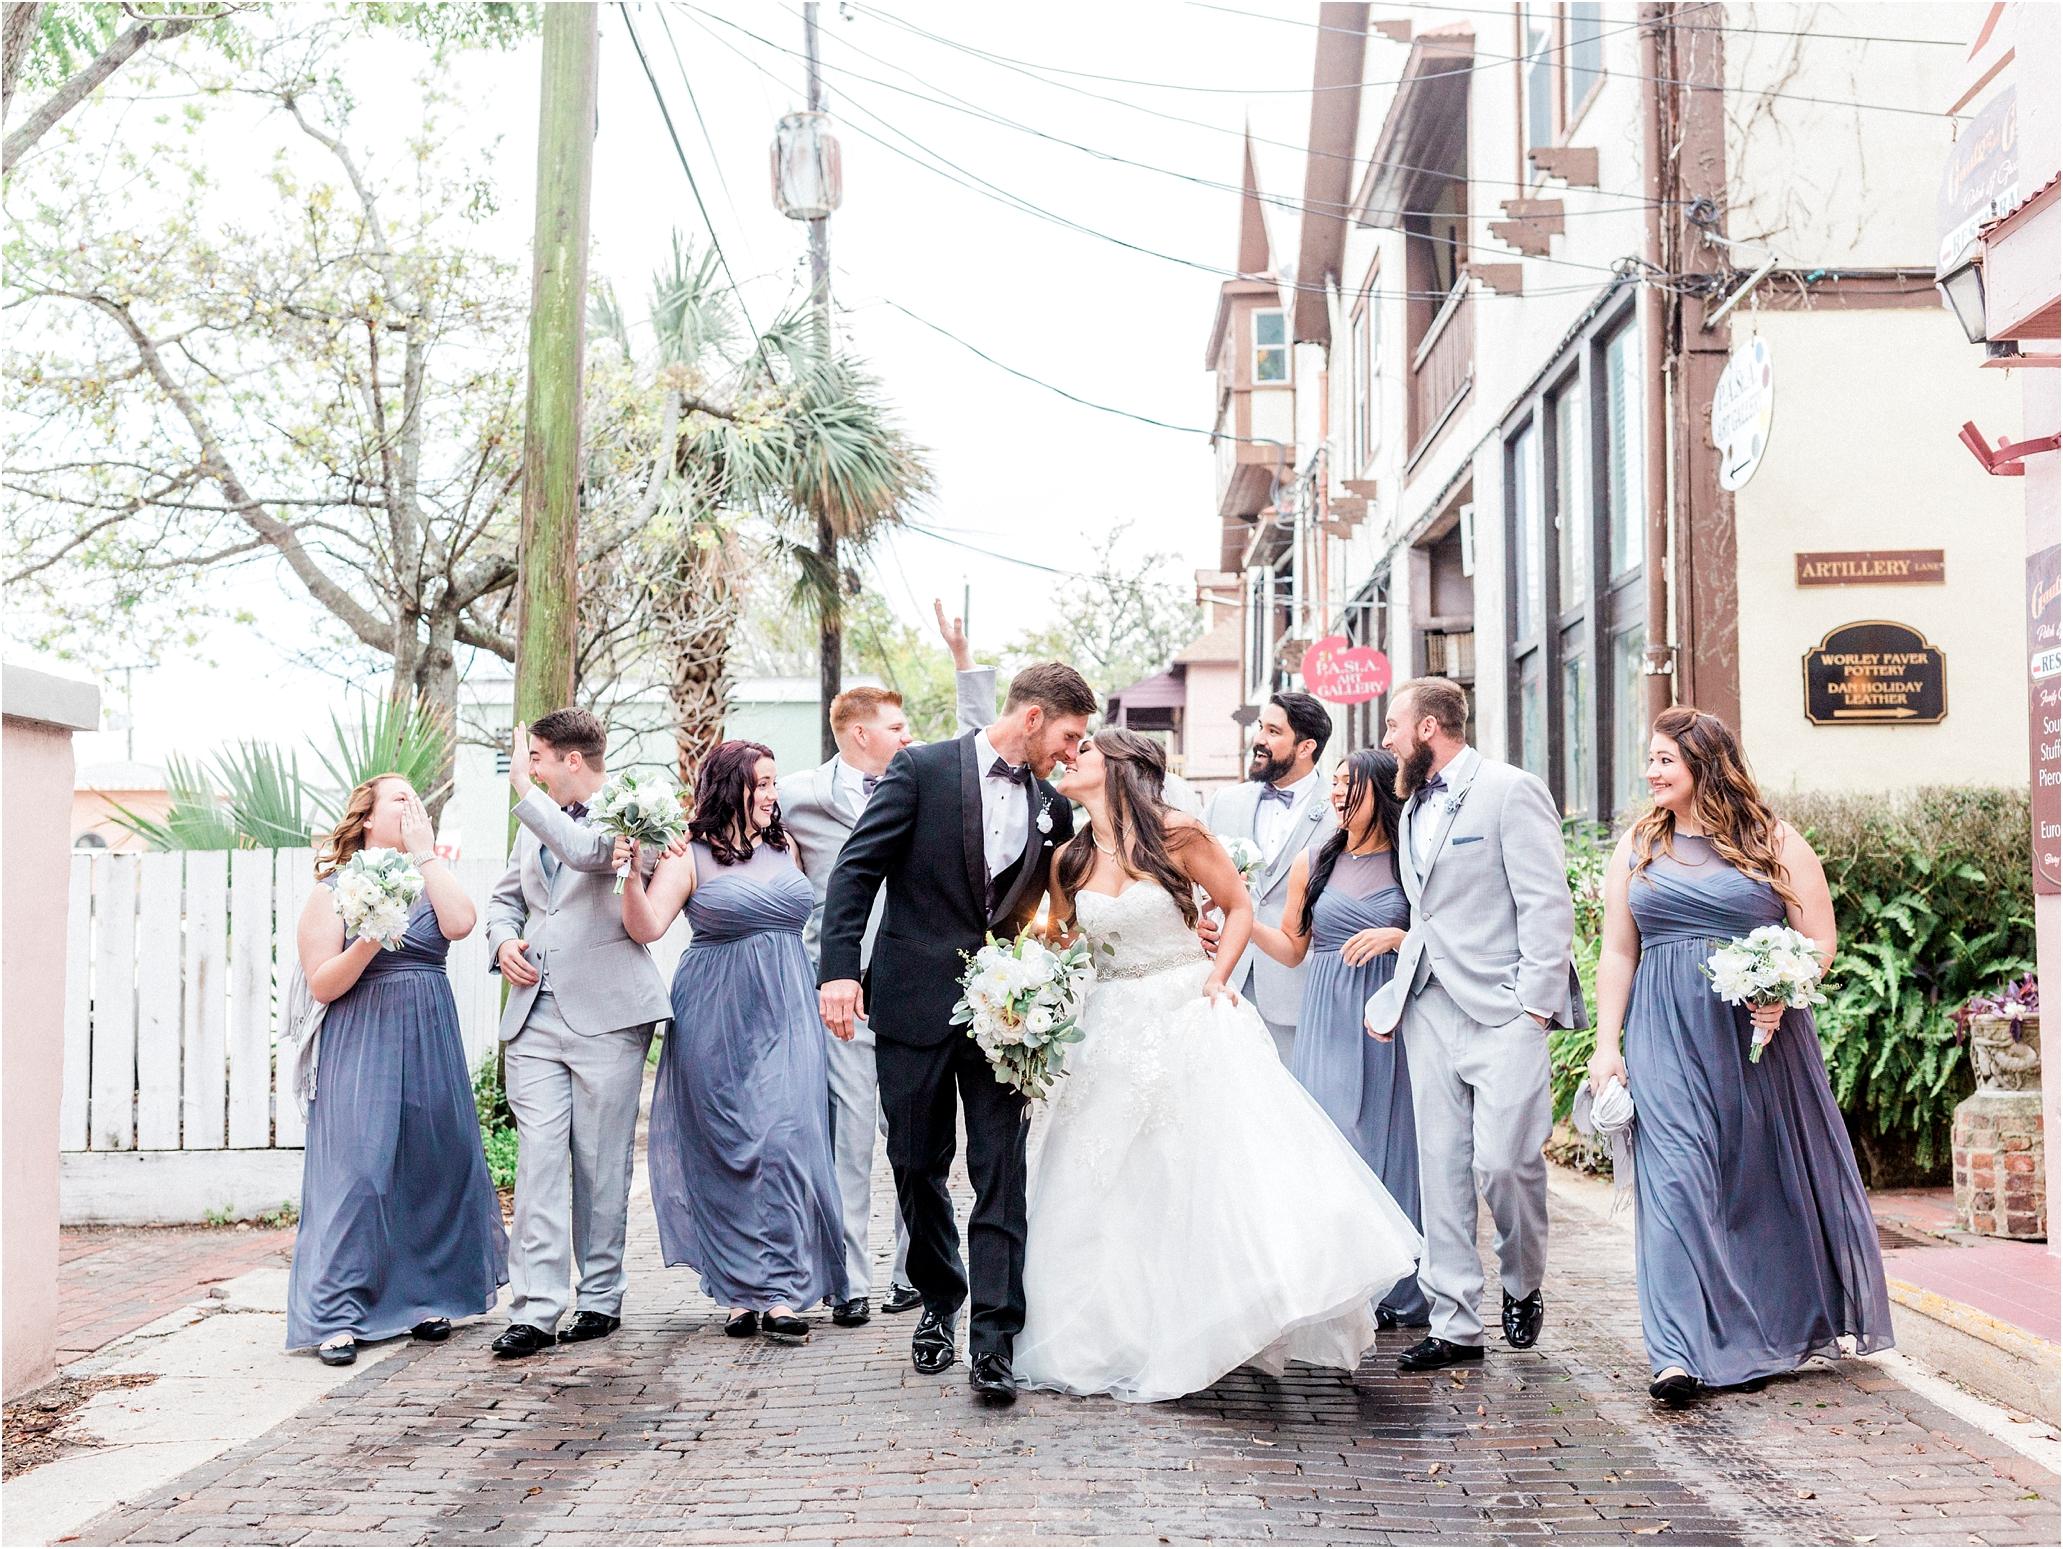 Lisa Silva Photography- Ponte Vedra Beach and Jacksonville, Florida Fine Art Film Wedding Photography- Wedding at The White Room Villa Blanca in St. Augustine, Florida_0057.jpg